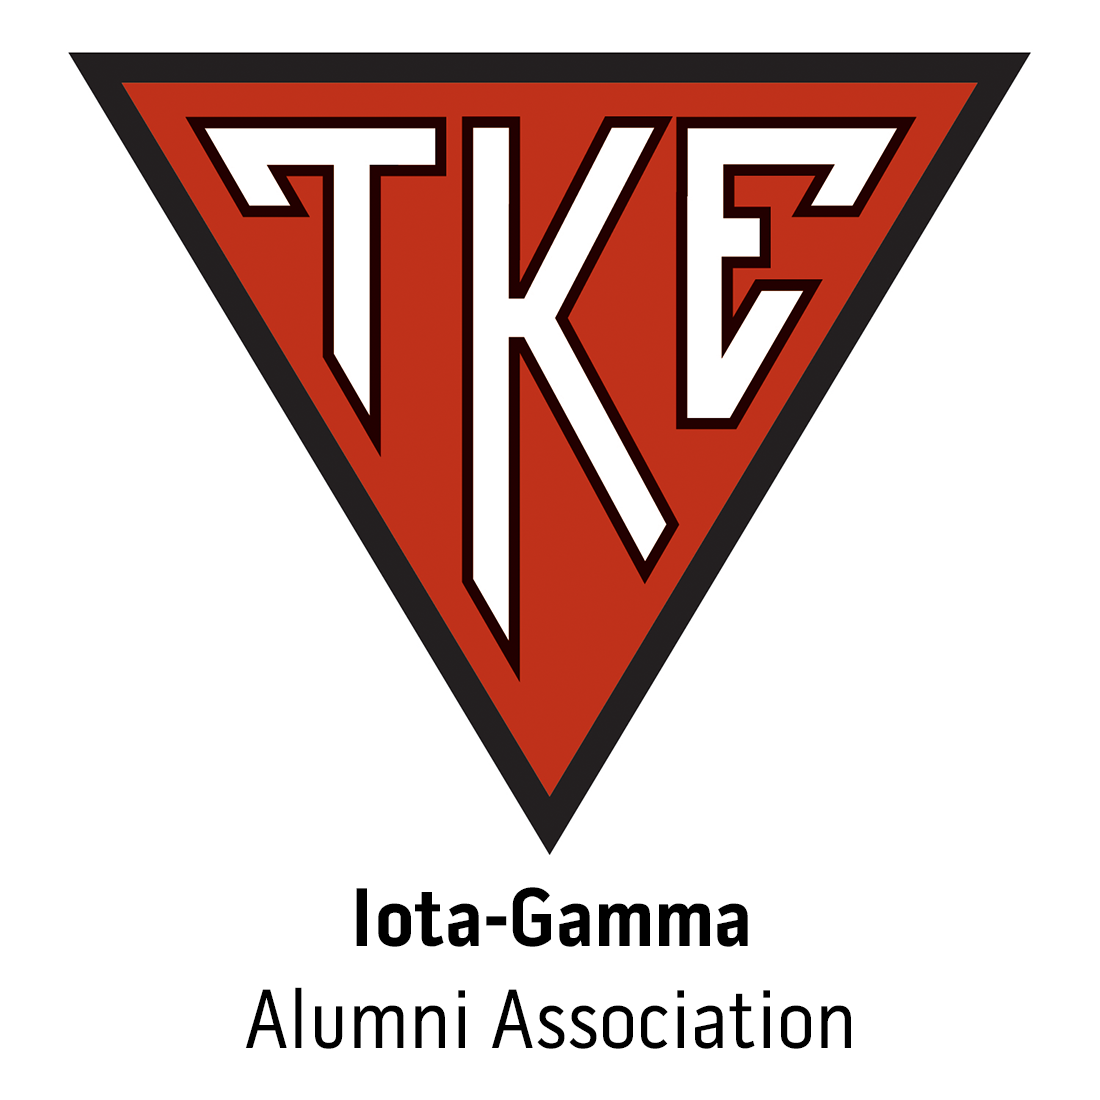 Iota-Gamma Alumni Association at Truman State University